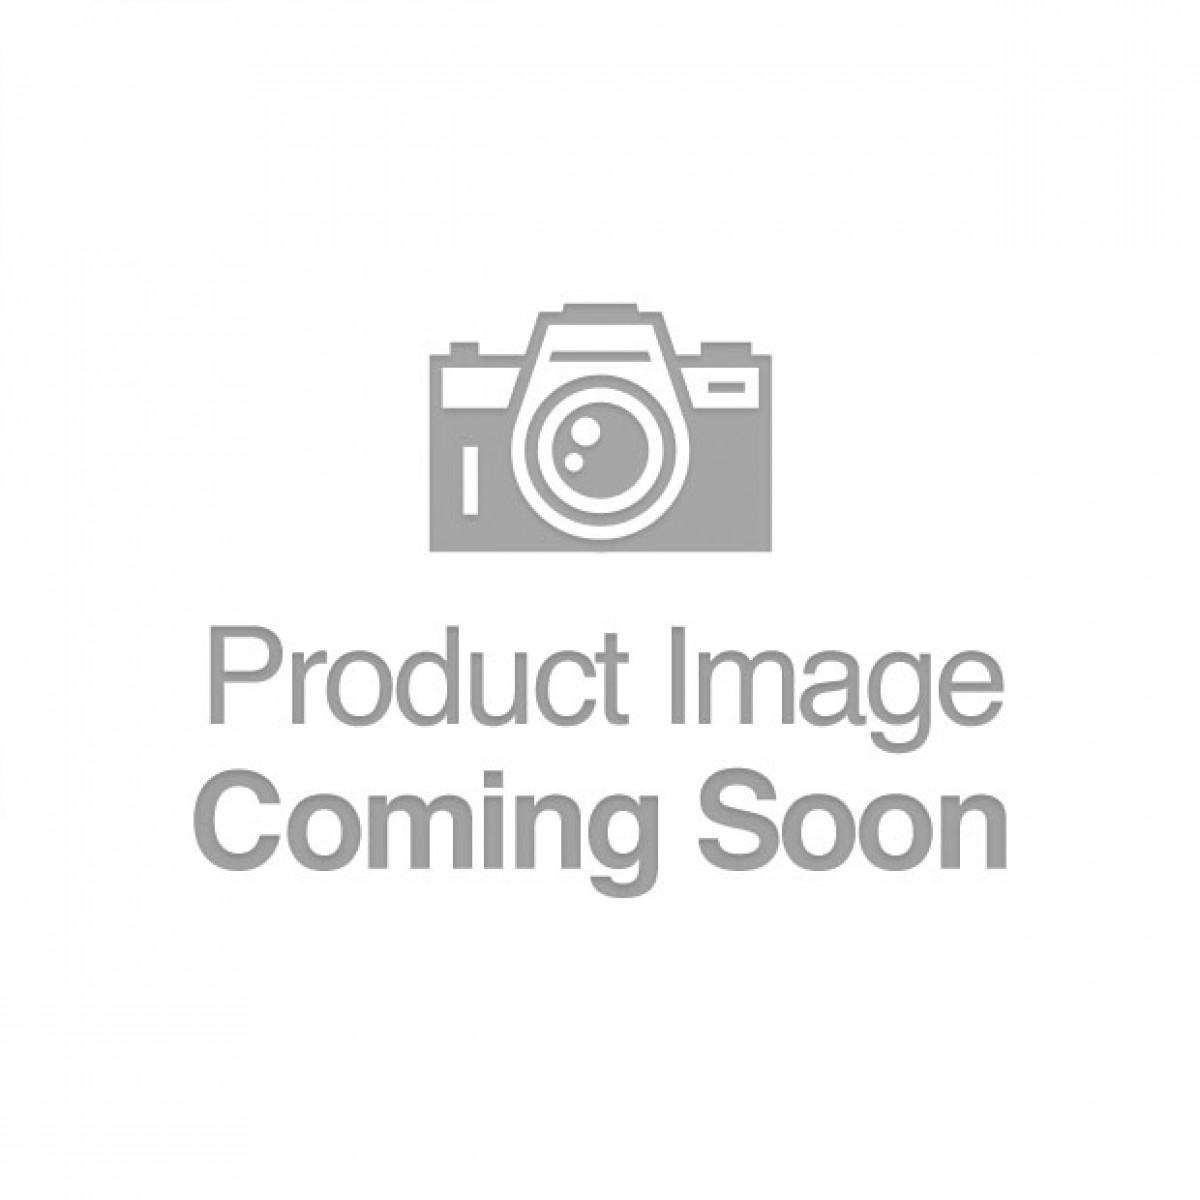 Earthly Body Massage & Body Oil - 8 oz Sunsational